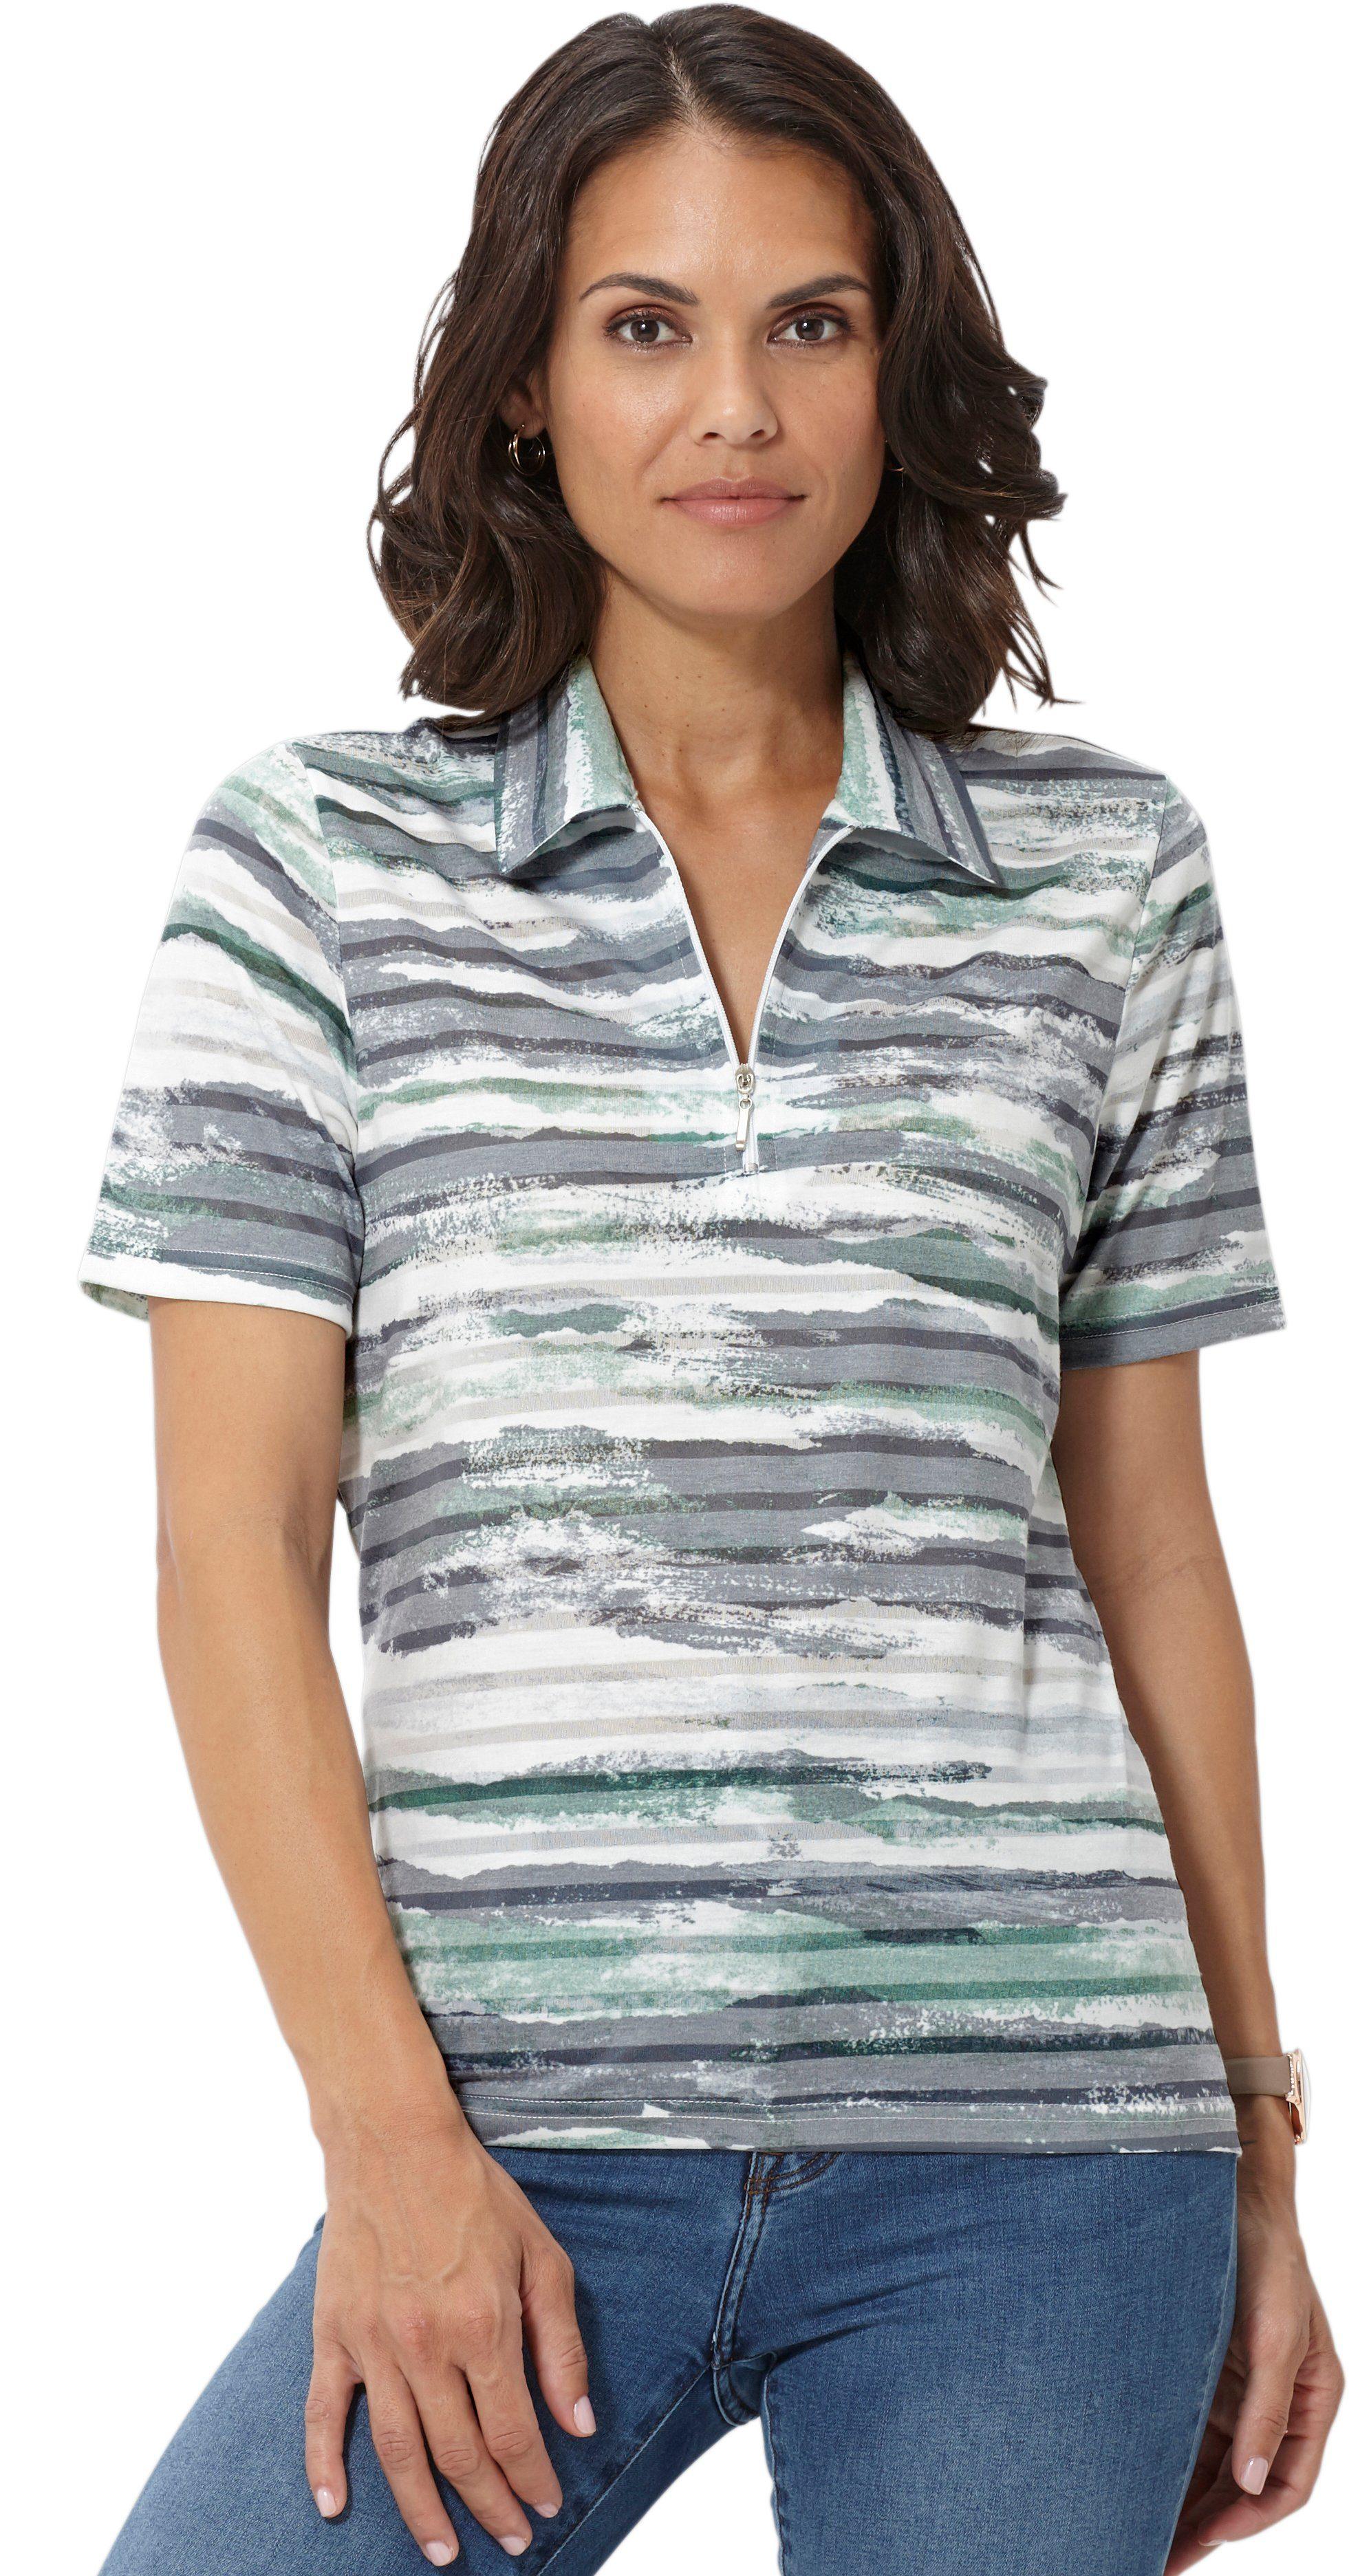 Casual Looks Shirt in feiner Ausbrenner-Qualität